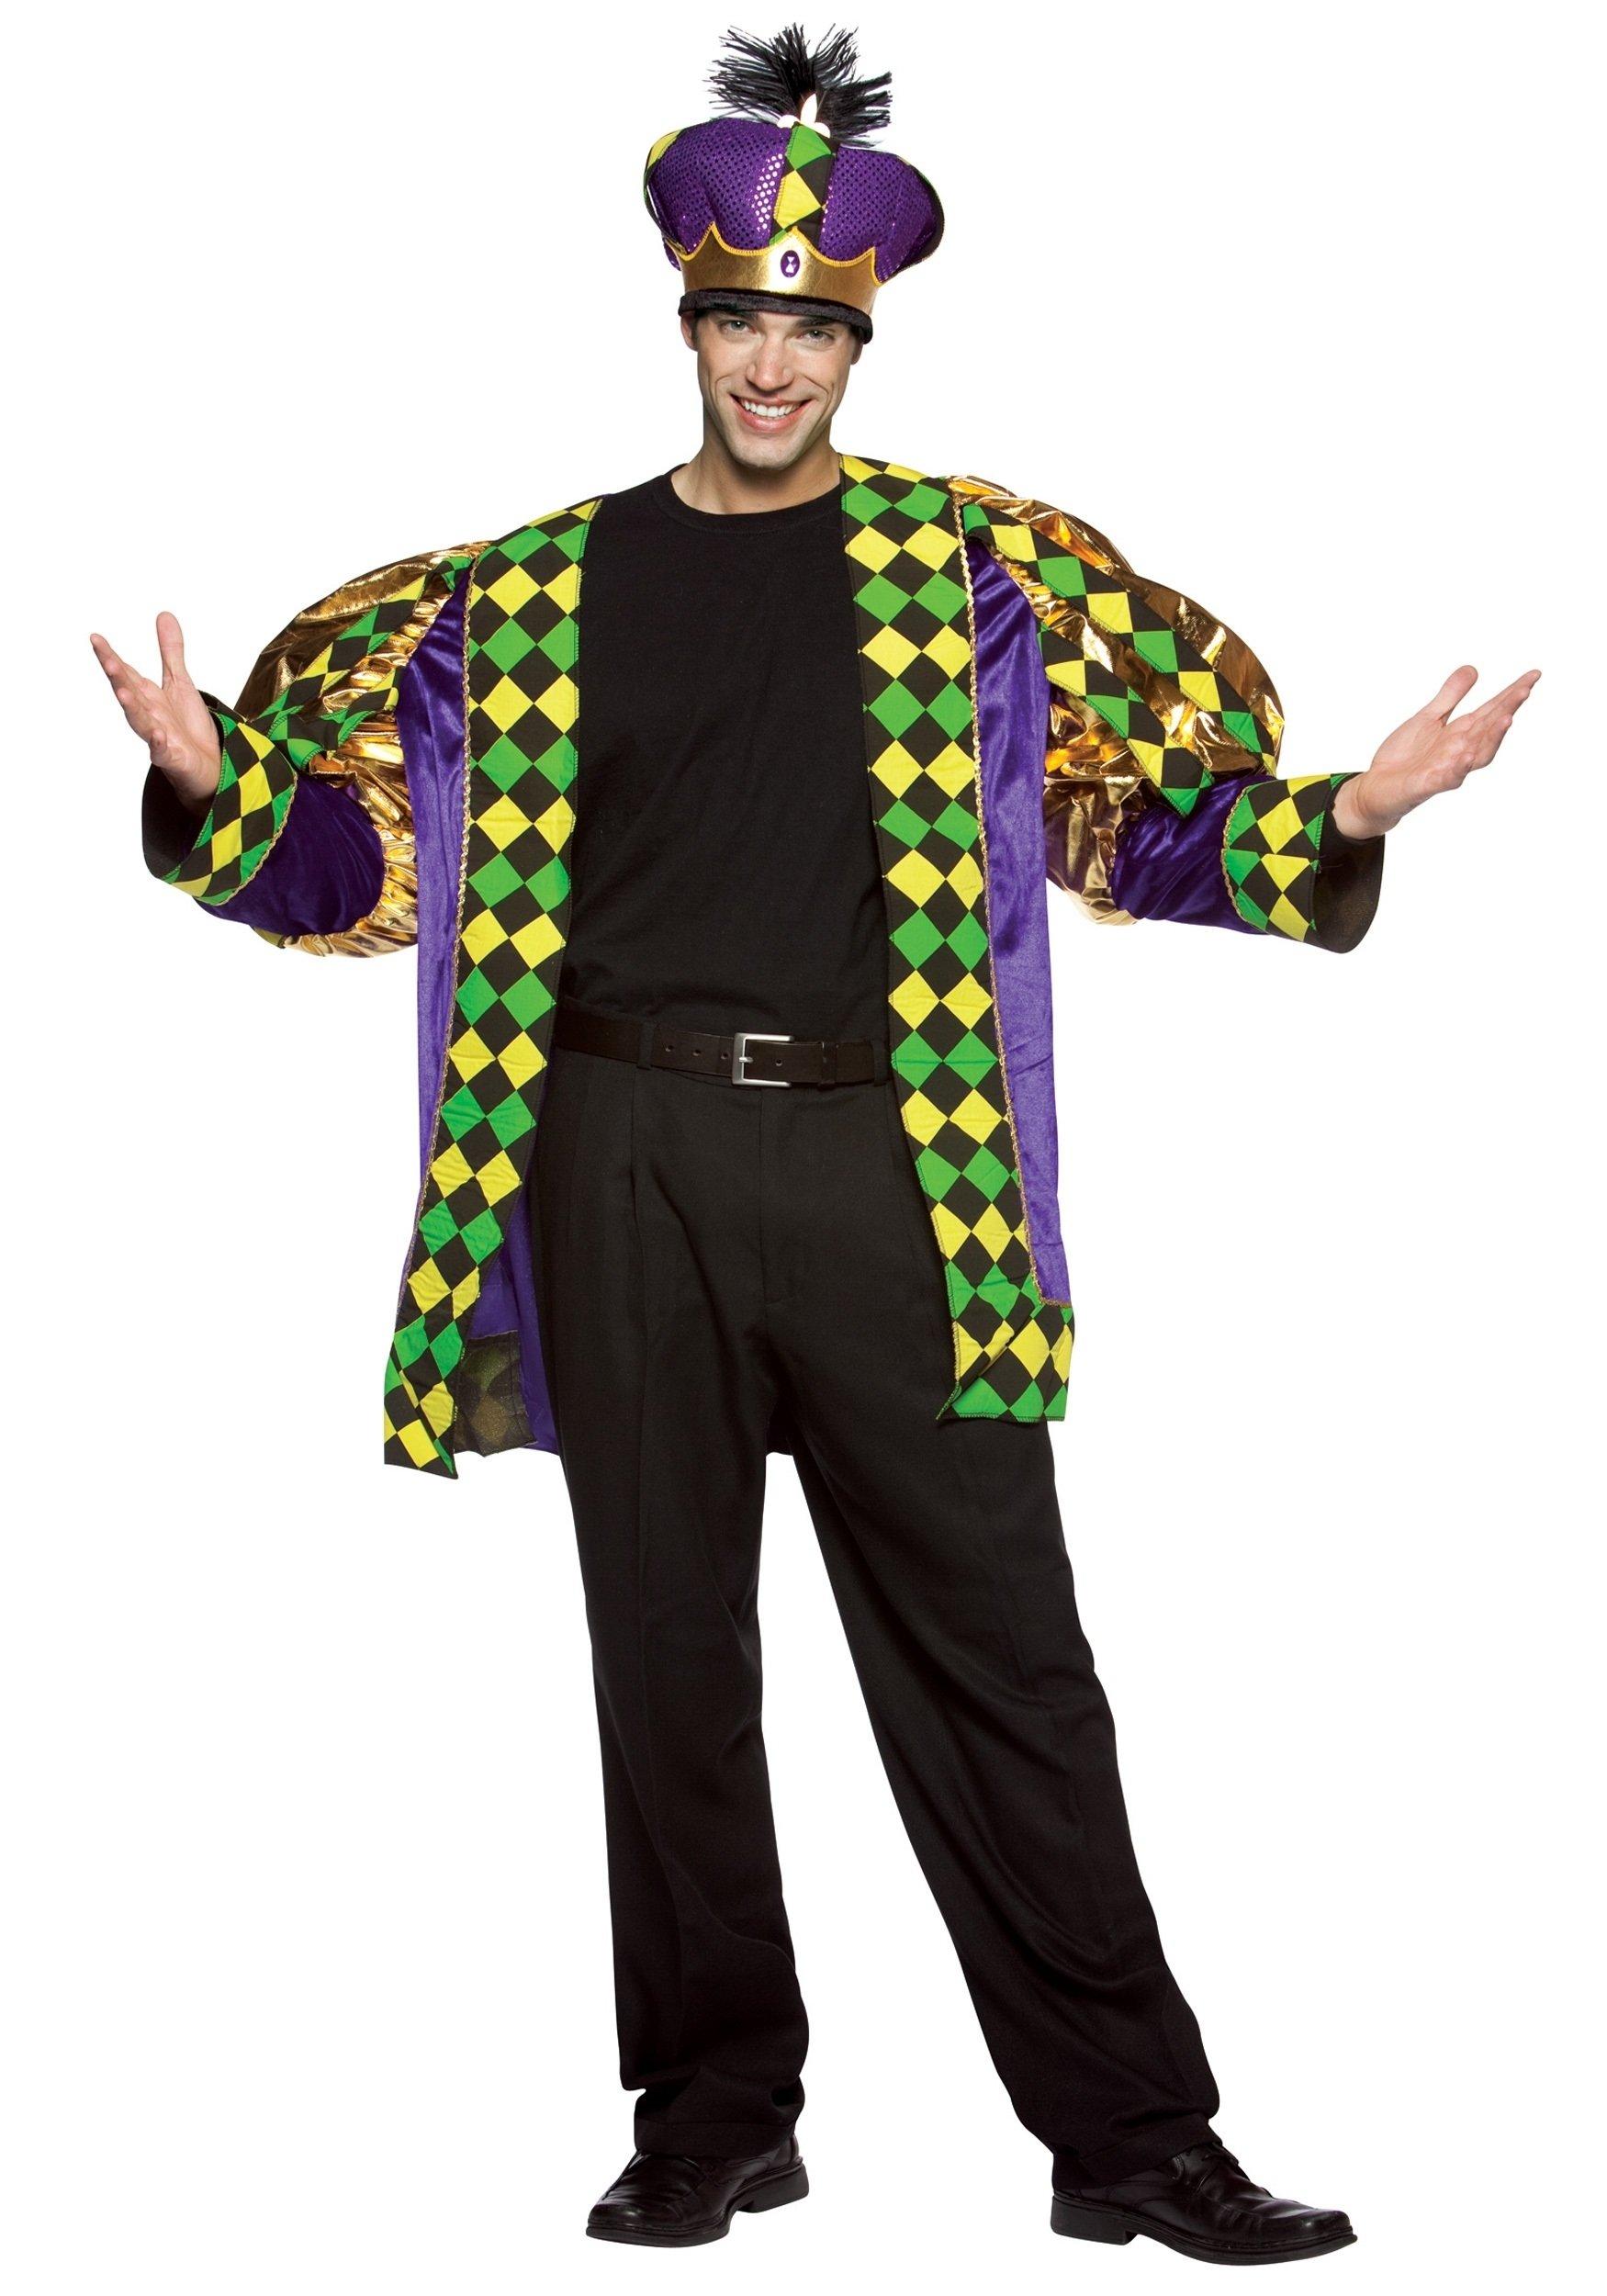 10 Fabulous Mardi Gras Costume Ideas For Couples adult mardi gras king costume 2021